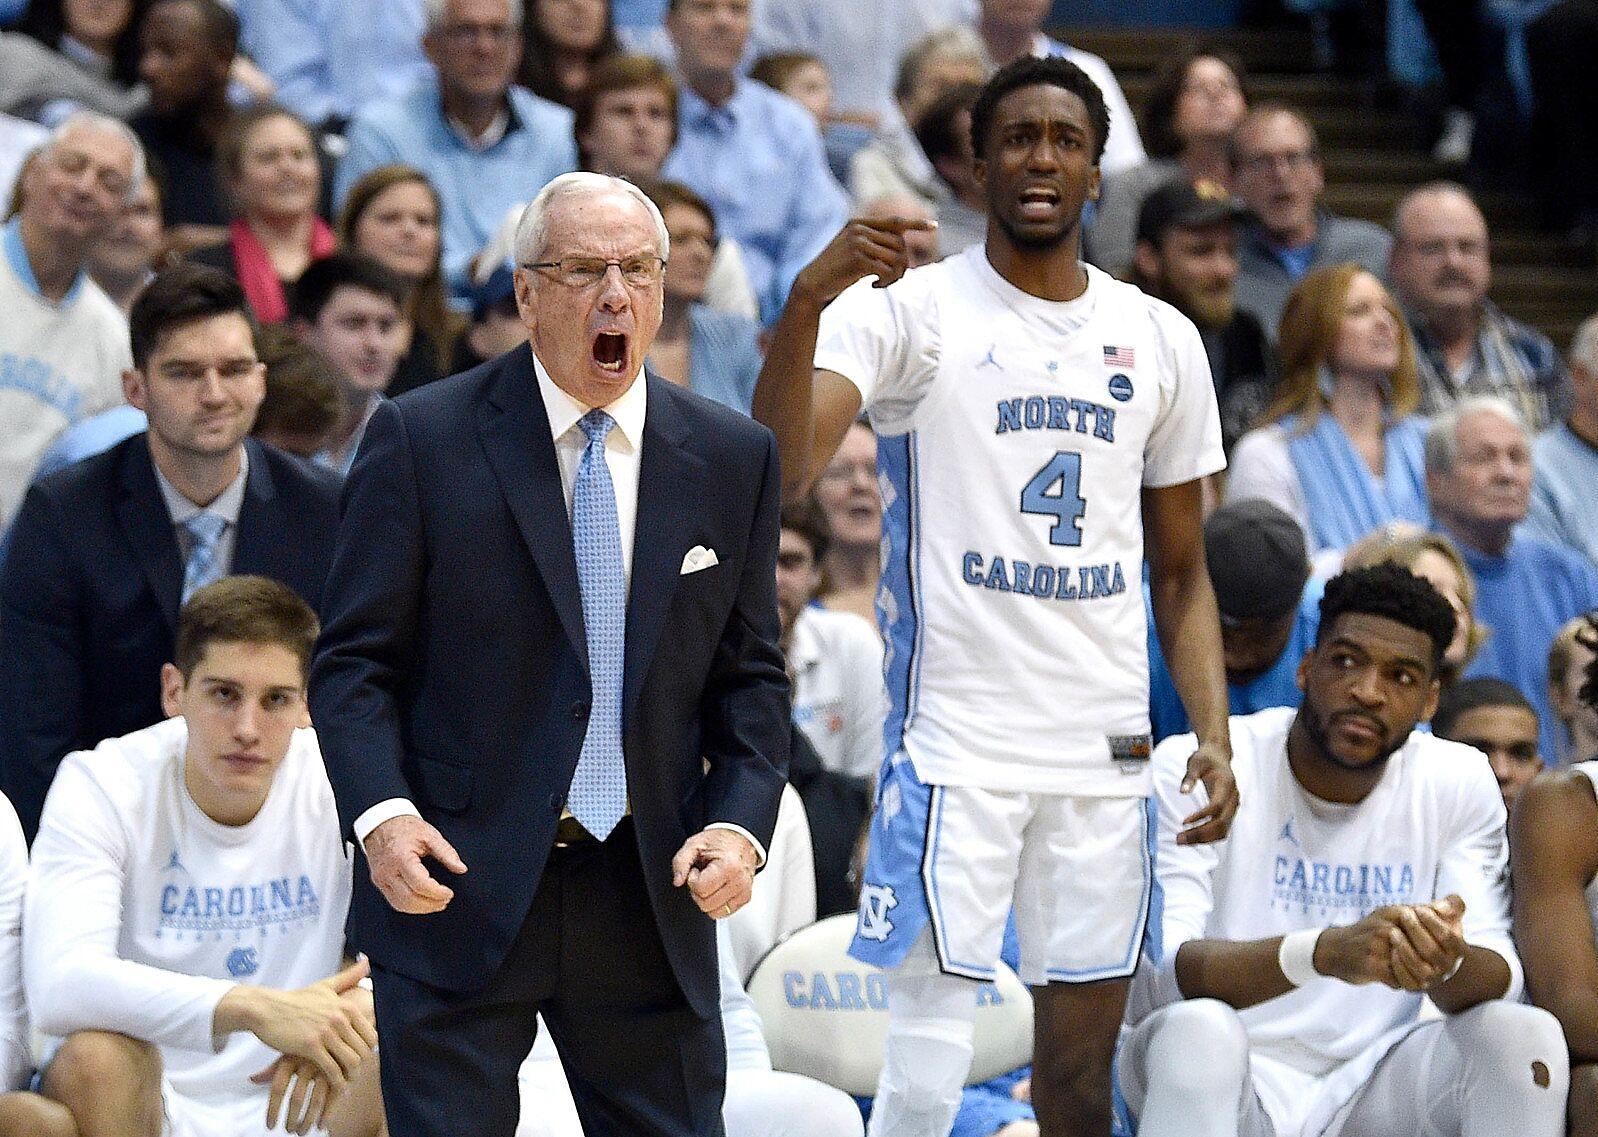 North Carolina Basketball: 3 keys for the Tar Heels against Harvard